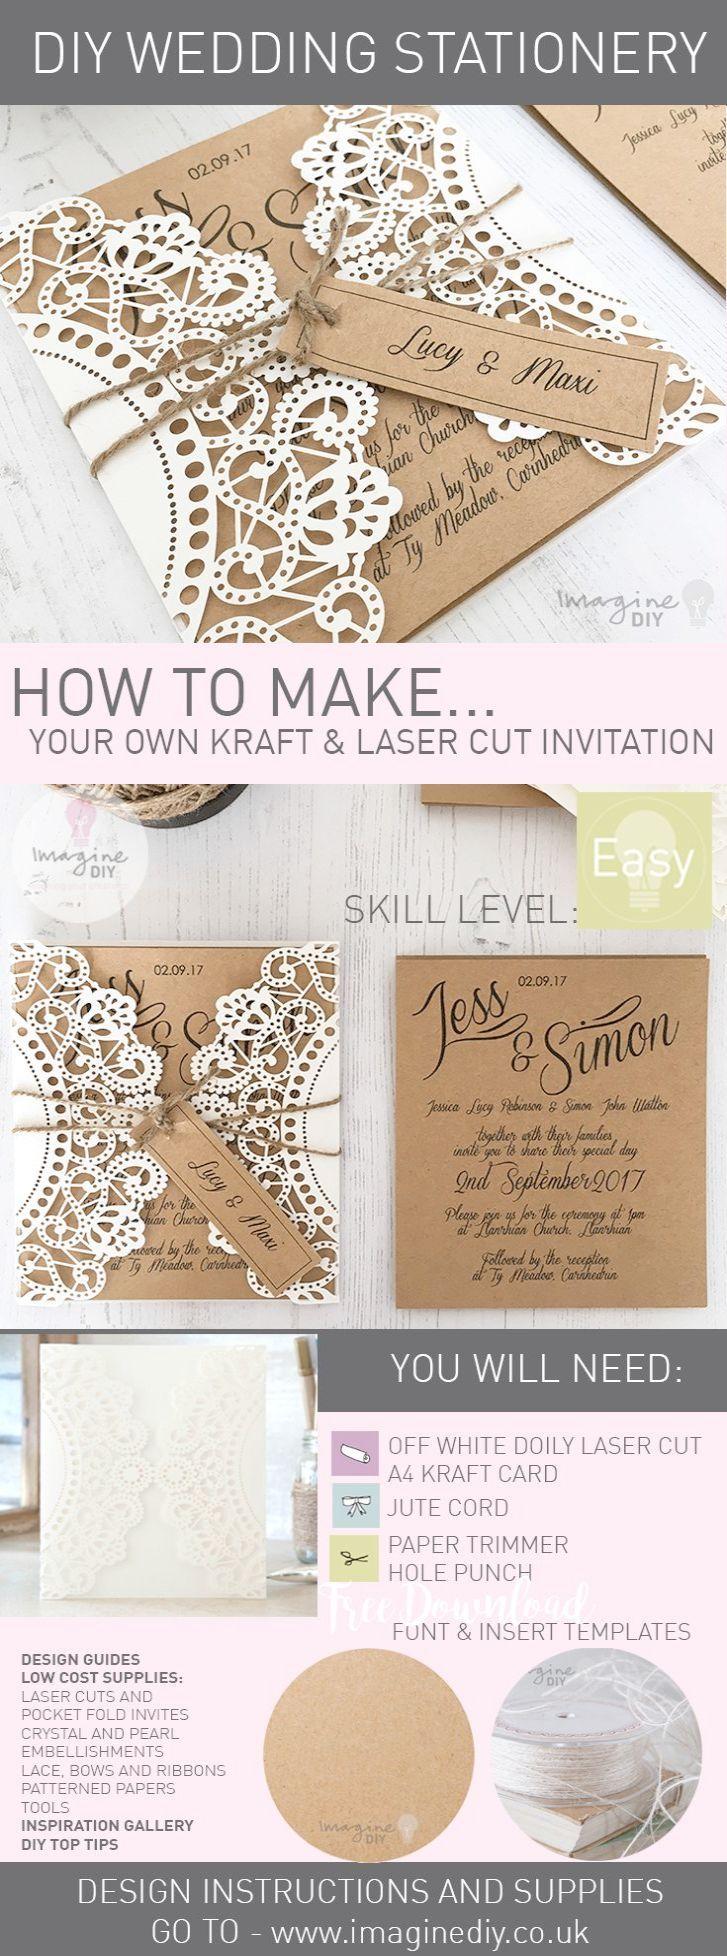 Wedding invitations greenville sc diy wedding invitations on word